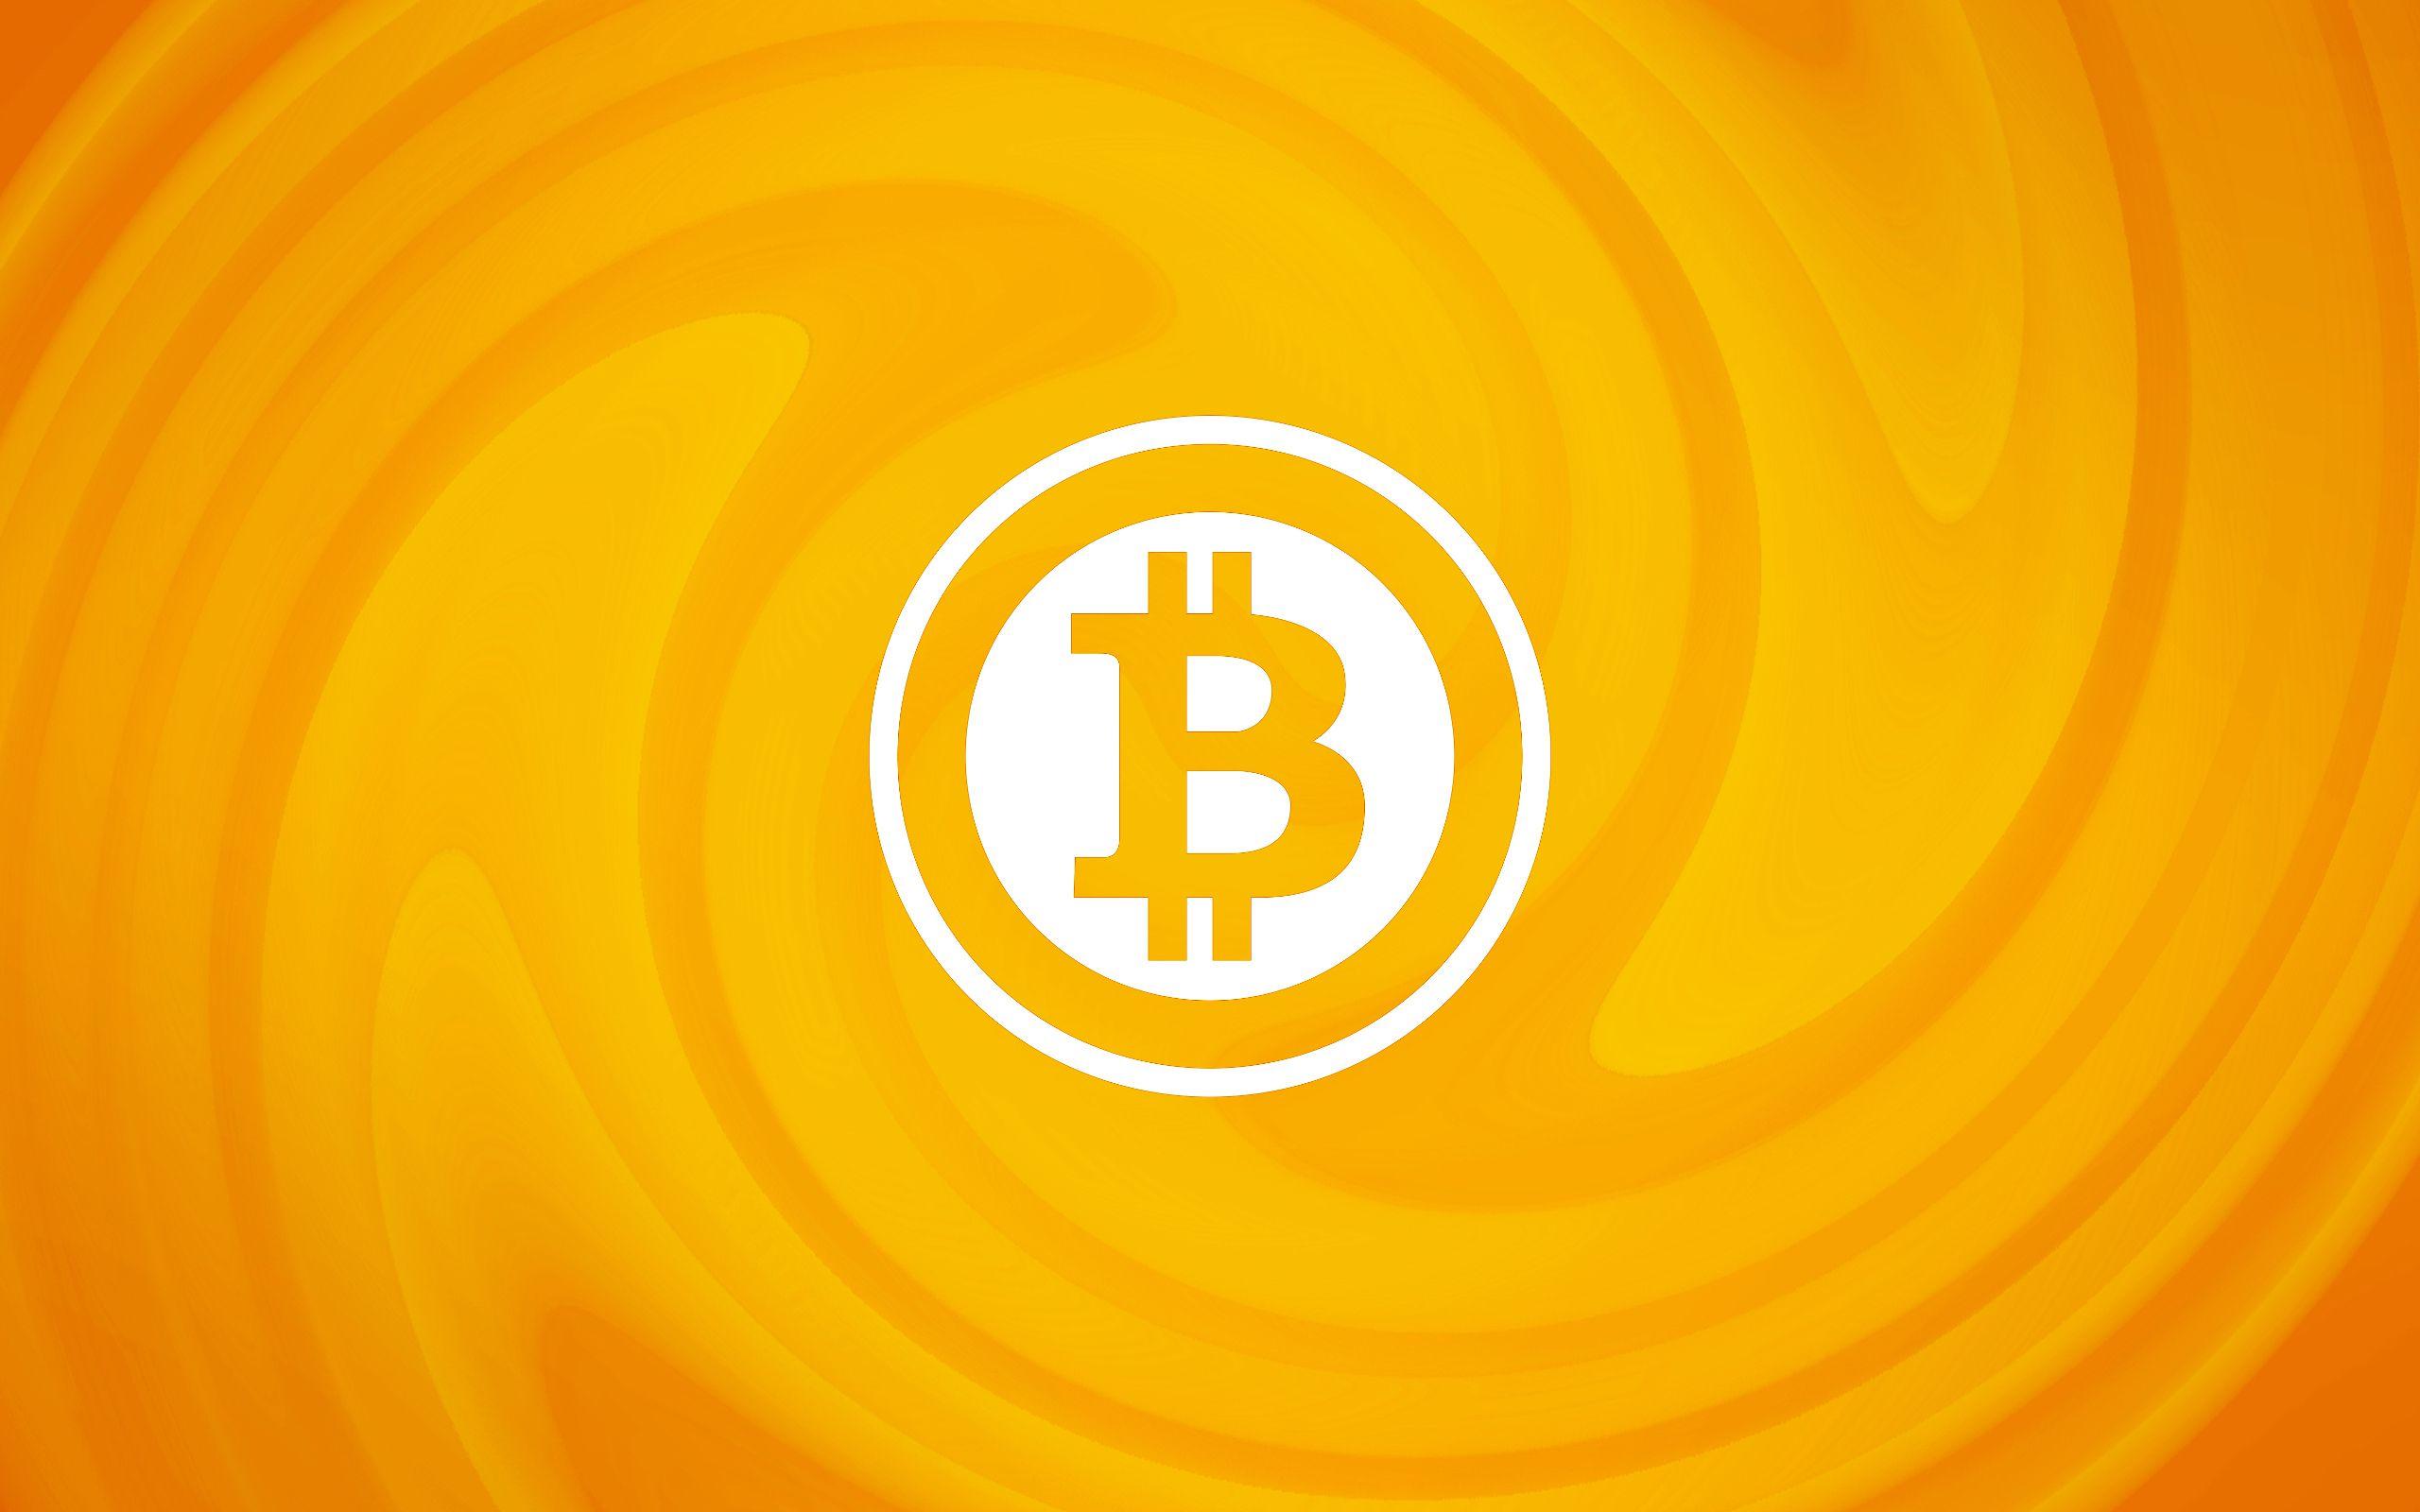 Full HD Orange Bitcoin Wallpaper